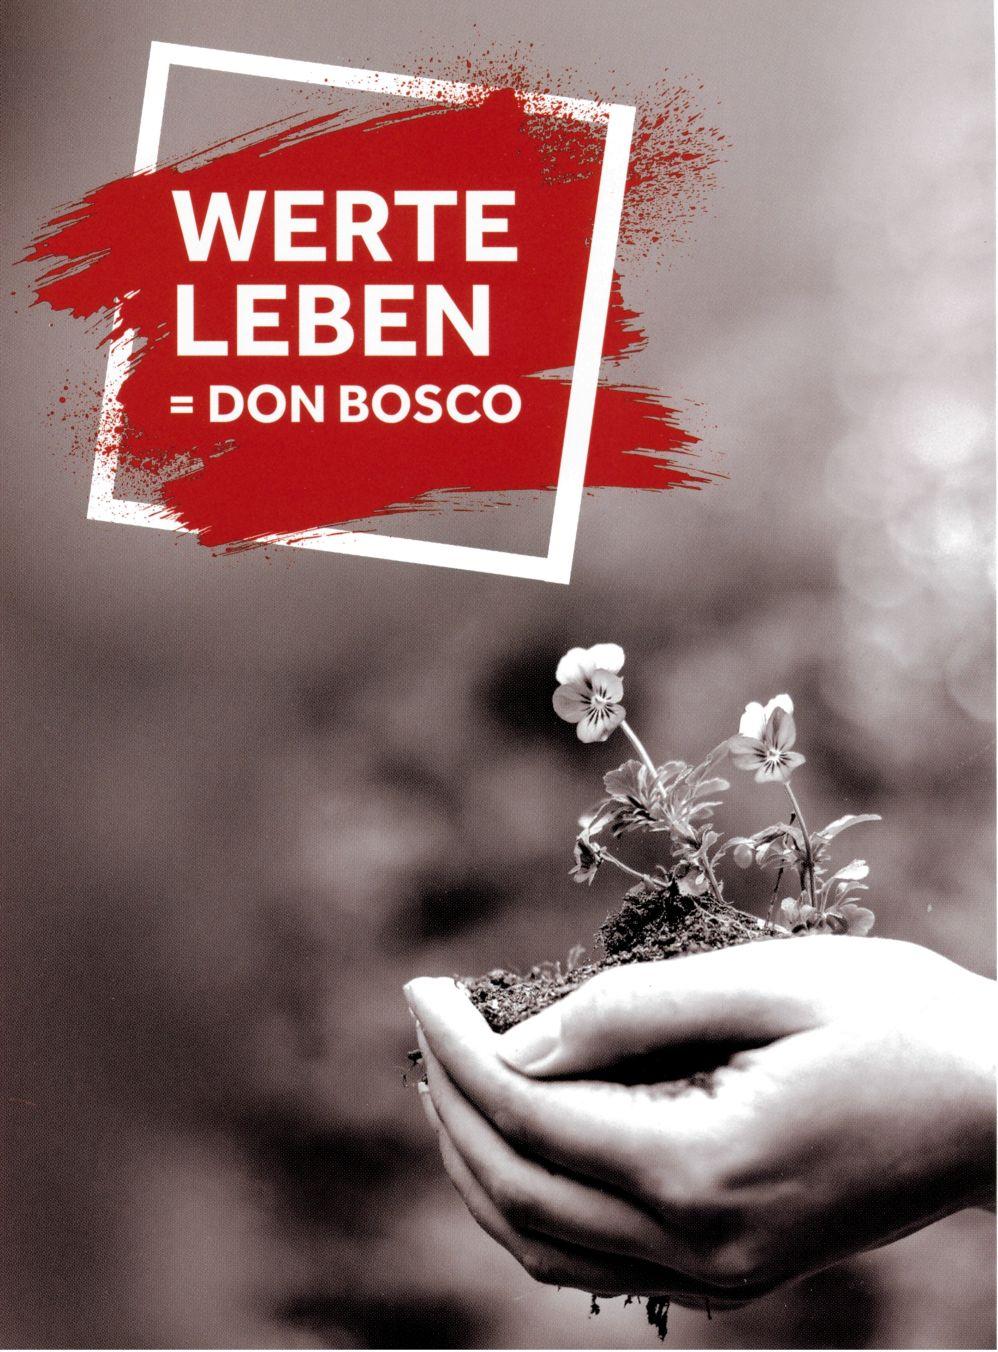 iWerte leben Don Bosco